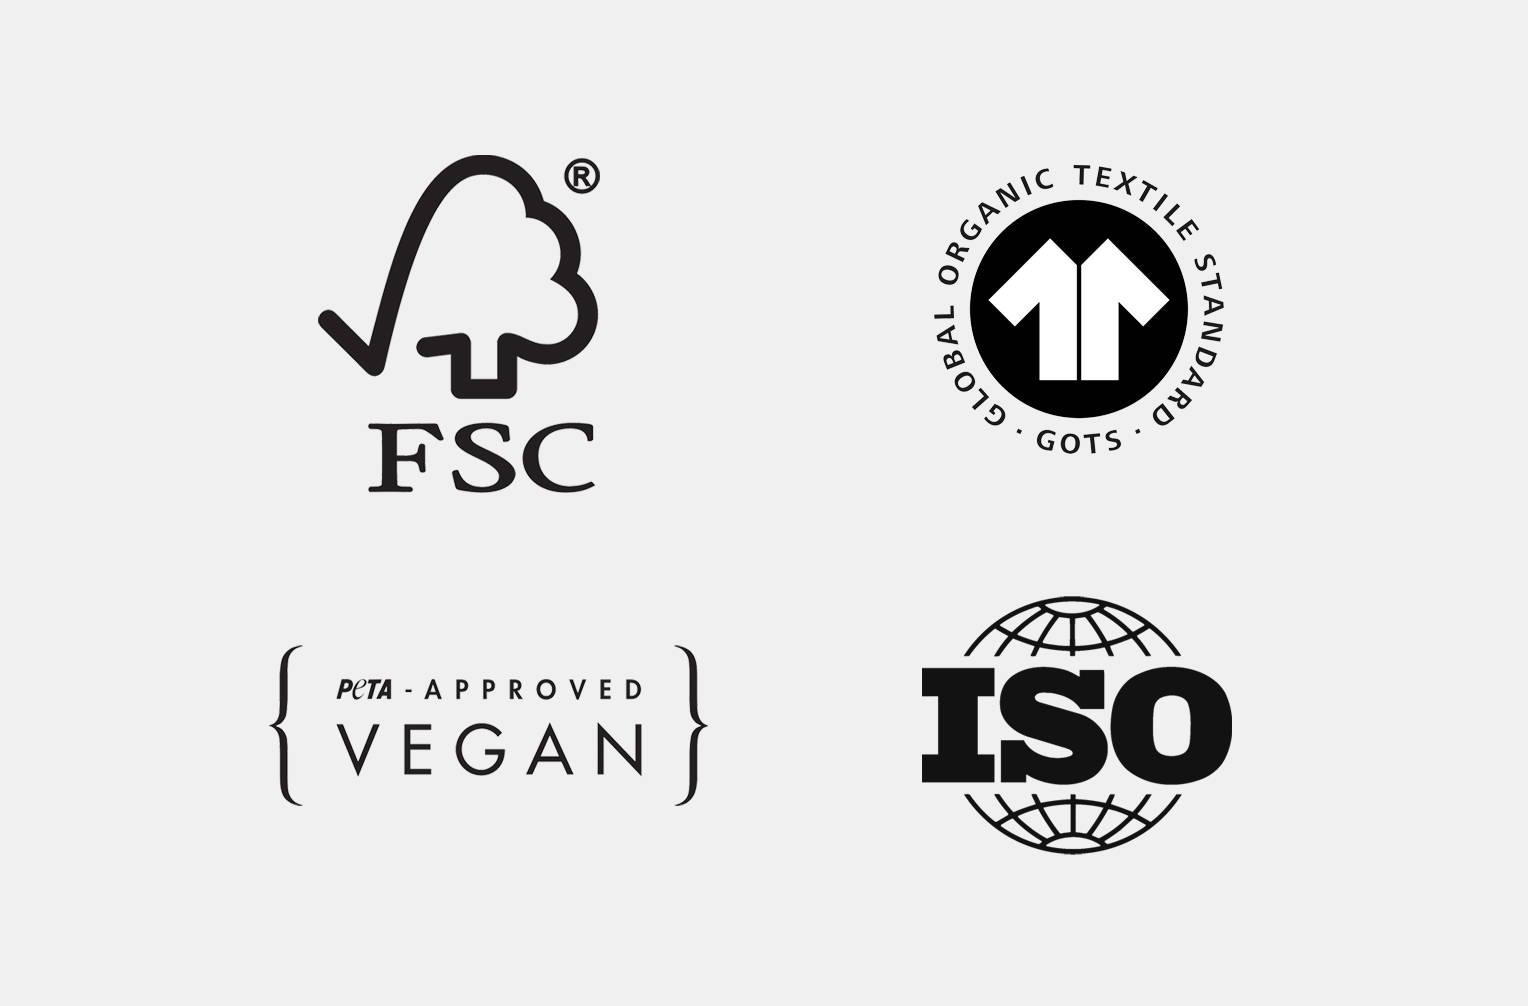 Responsible sourcing certifications